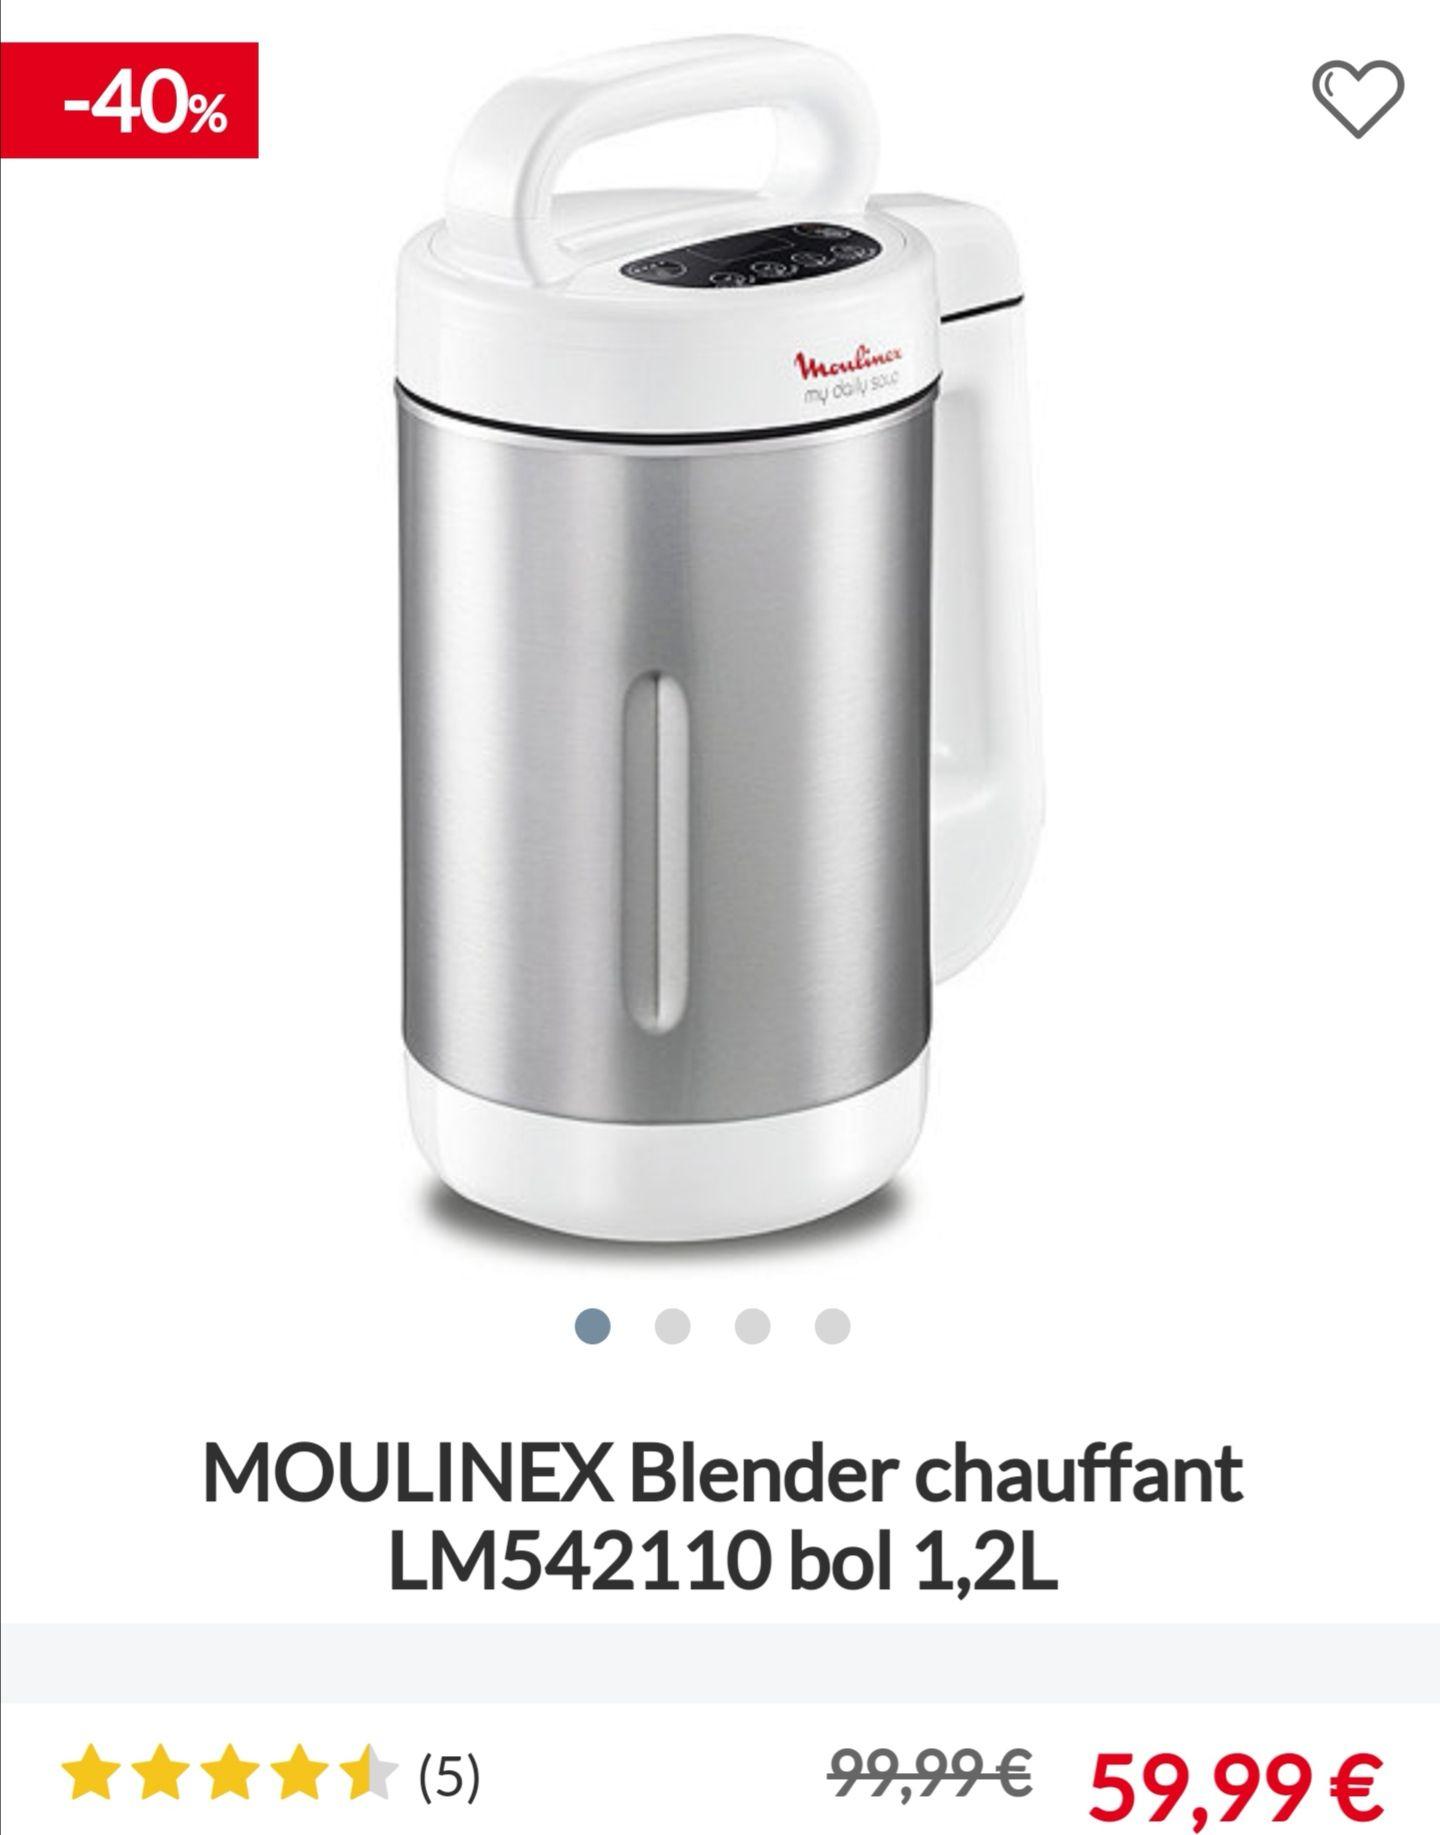 Blender Chauffant Moulinex LM542110 - 1,2L / 1000w